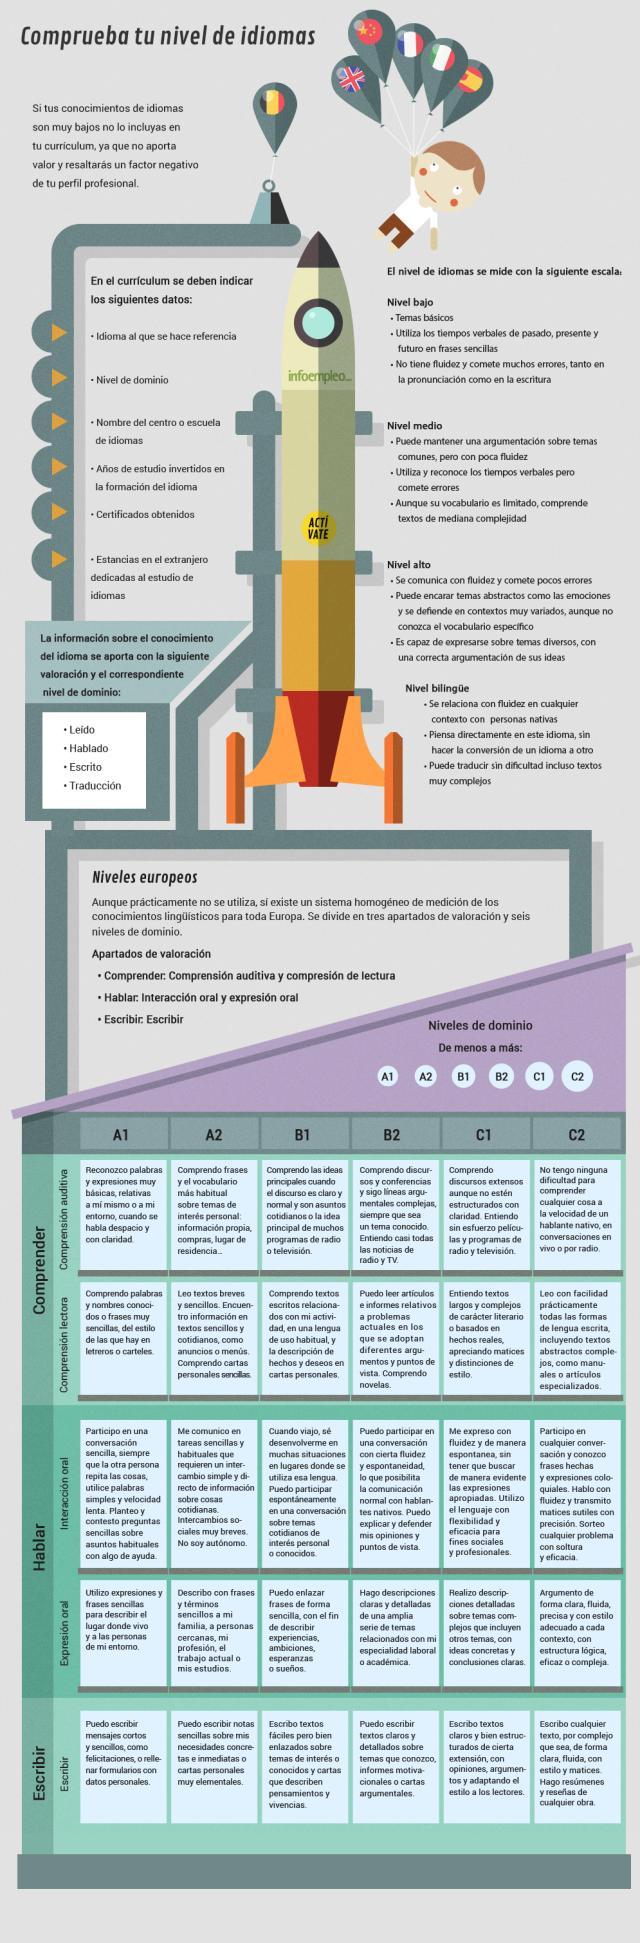 Cómo poner el nivel de idiomas en tu Curriculum #infografia #infographic #empleo